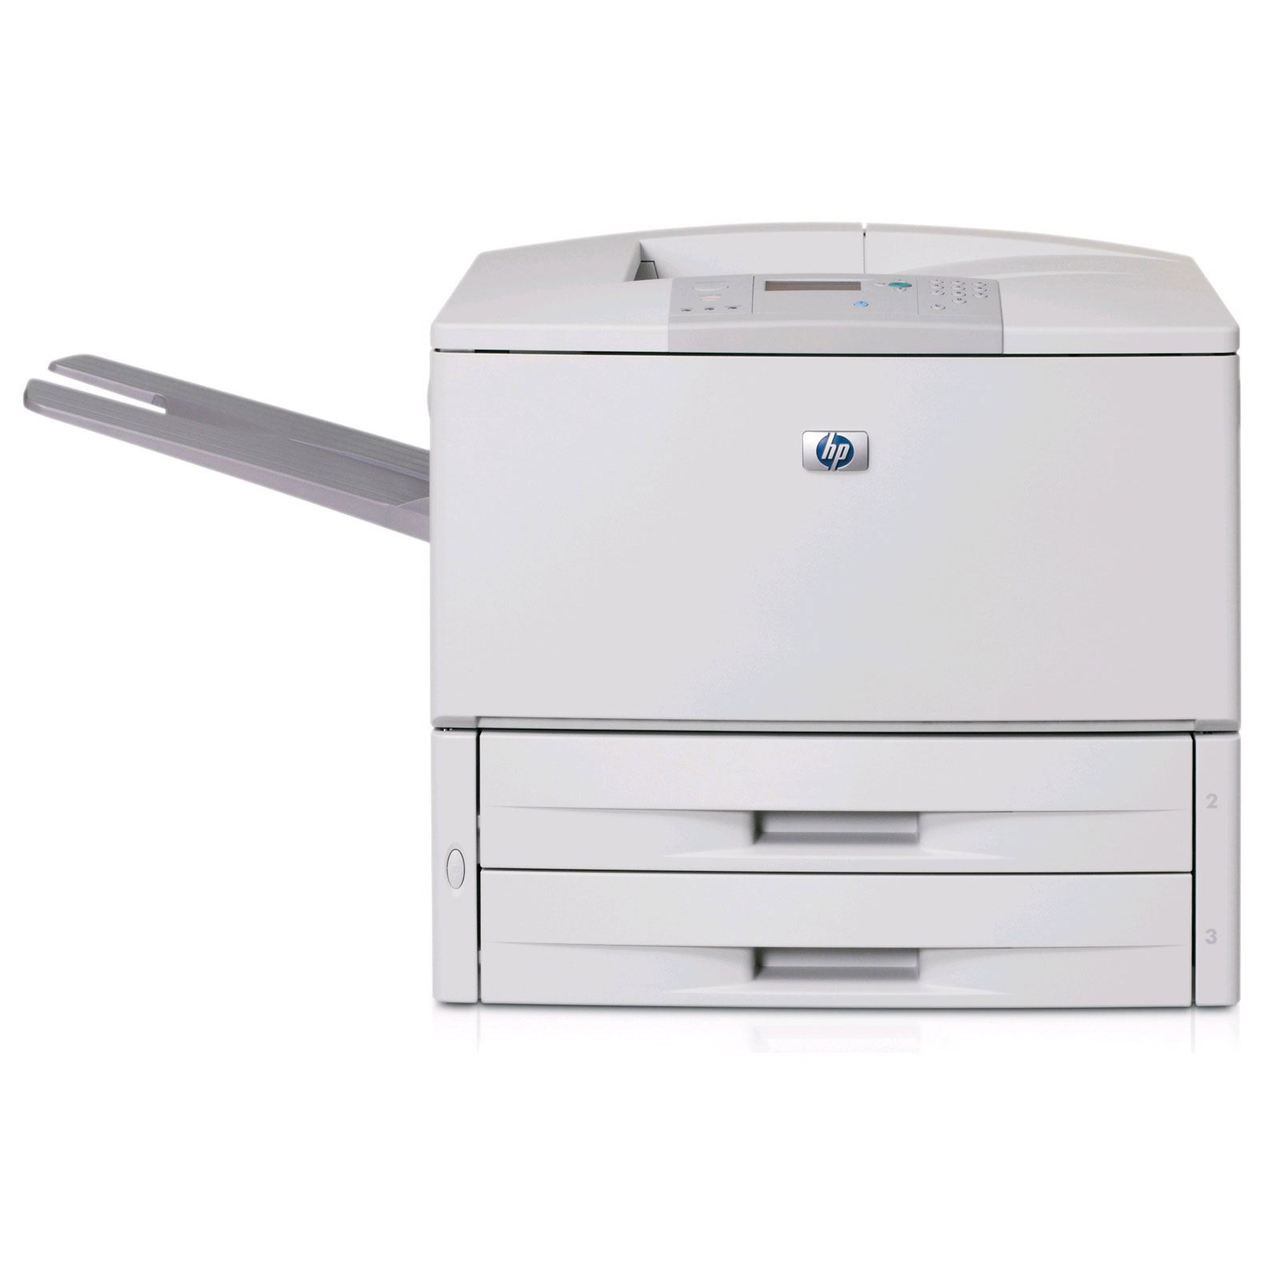 HP LaserJet 9050DN - Q3723A - HP 11x17 Laser Printer for sale